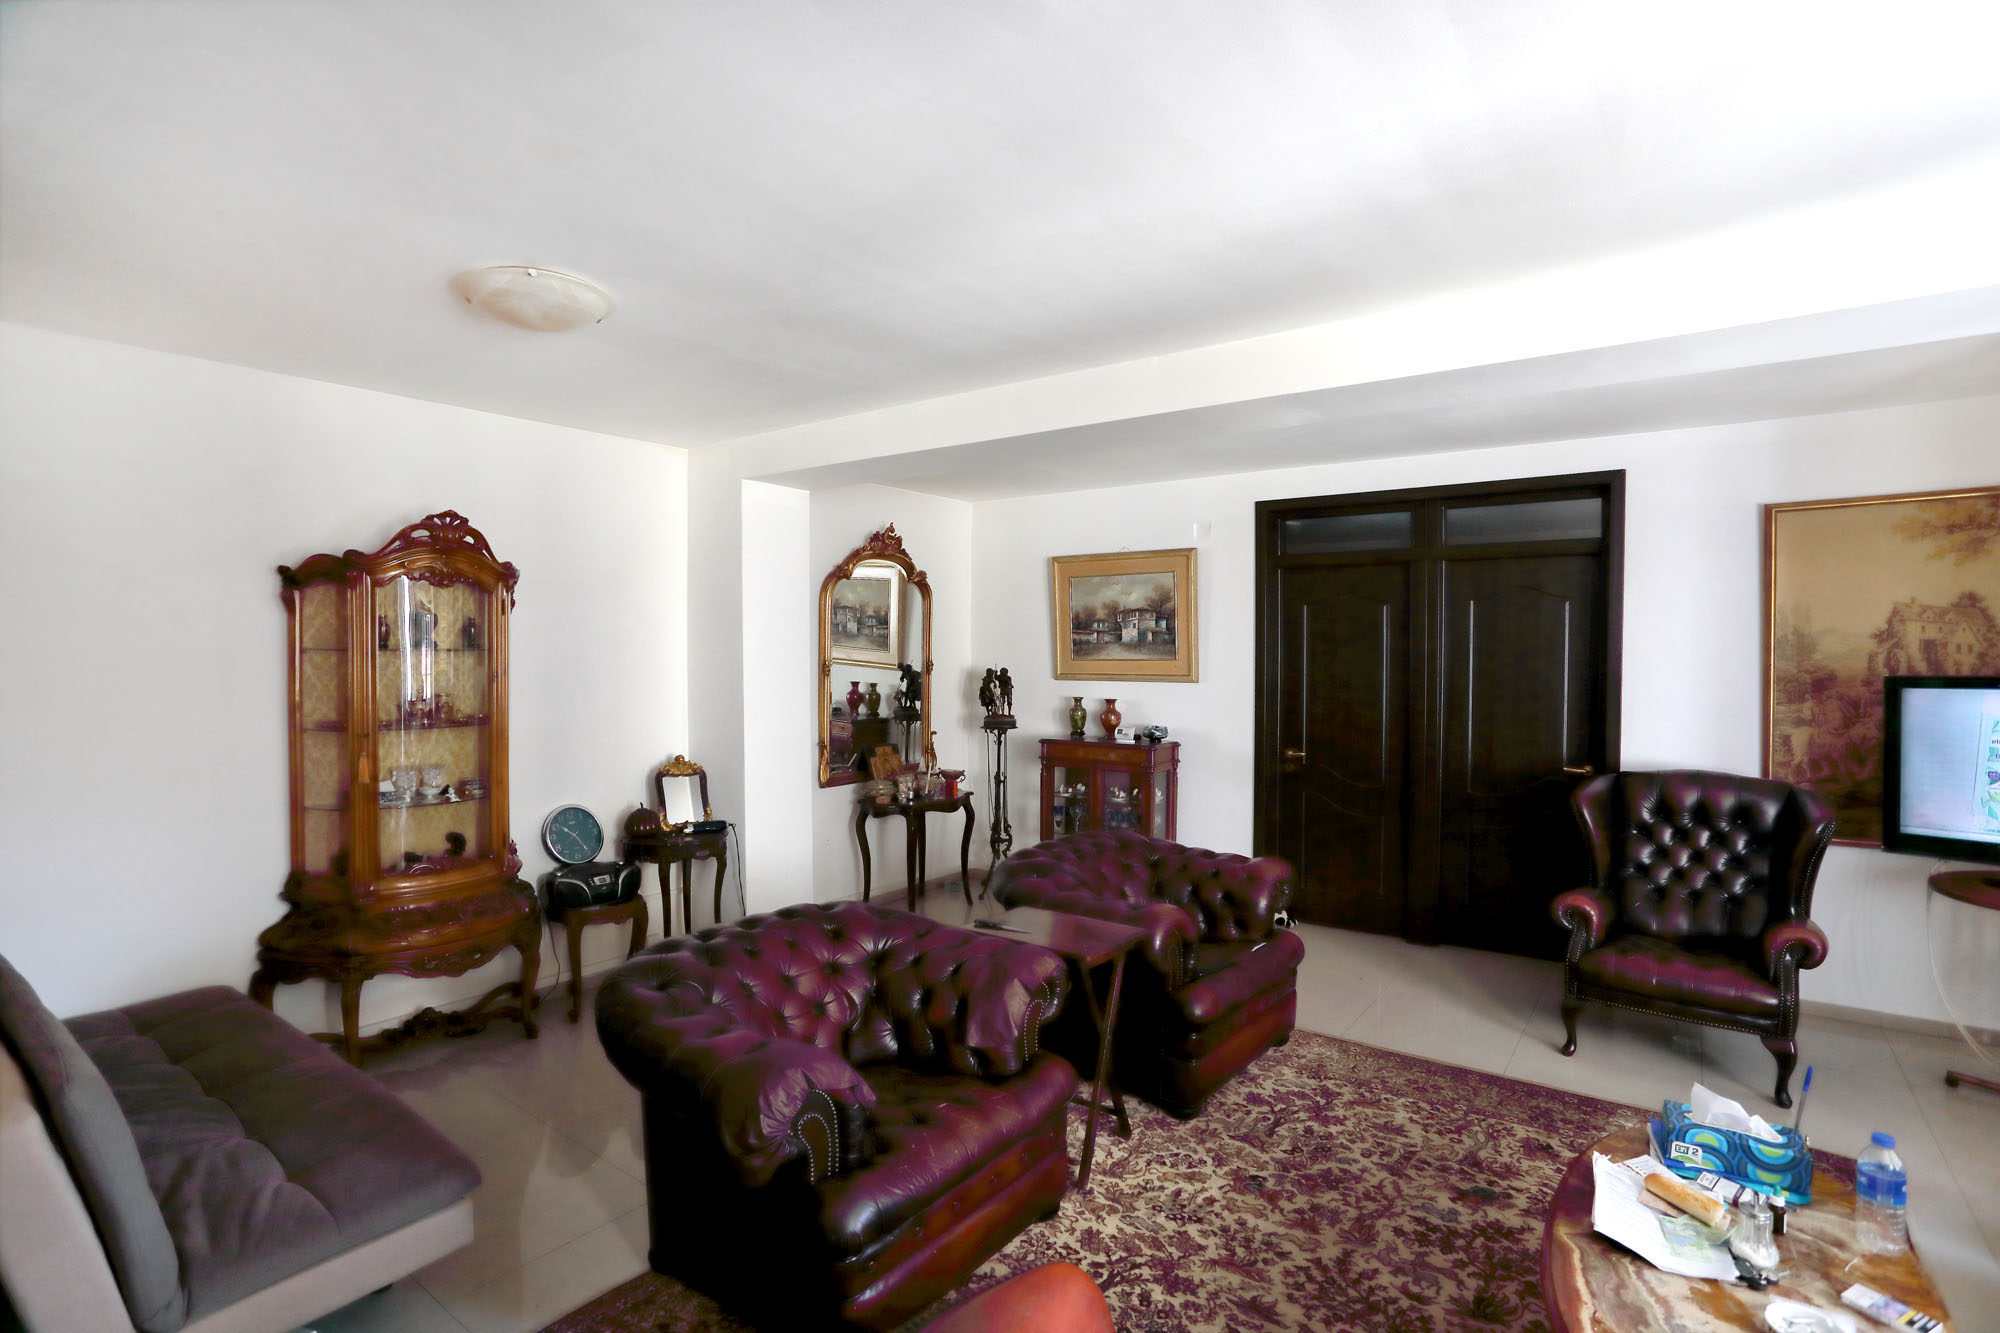 https://ahe-ro.s3.amazonaws.com/2853/casa_cu_ferestre_venetiene_9_.jpg